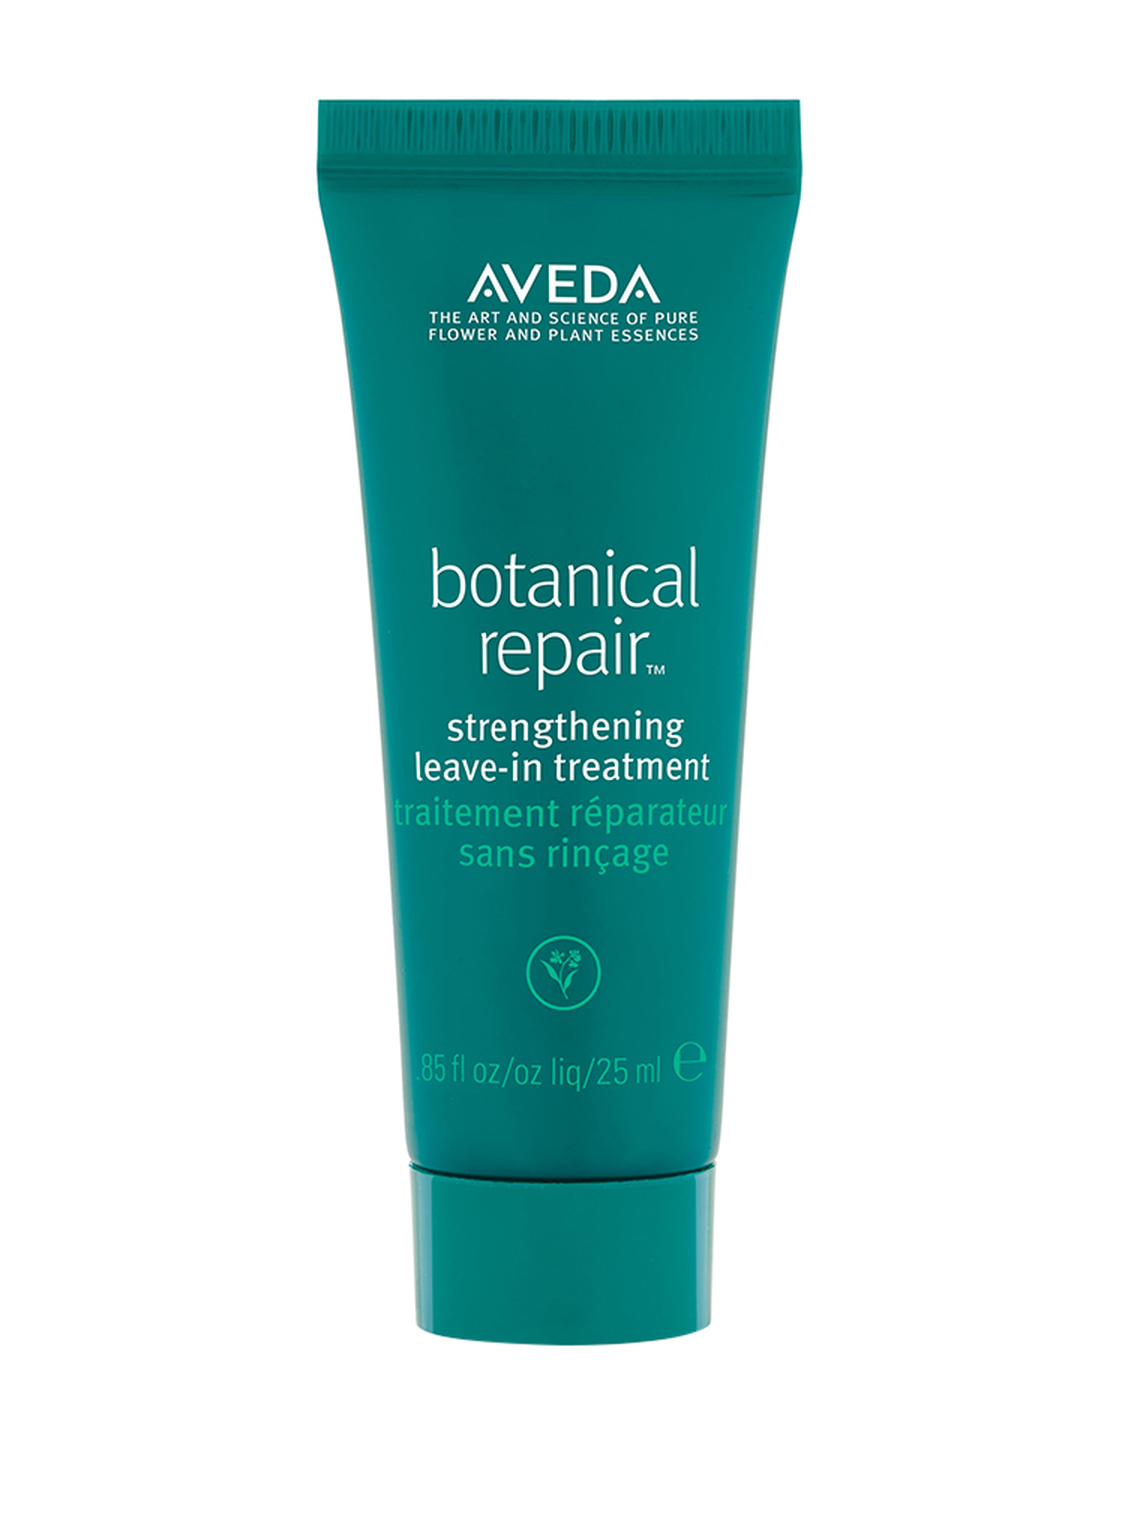 Image of Aveda Abotanical Repair Strenghening Leave-in Treatment 25 ml